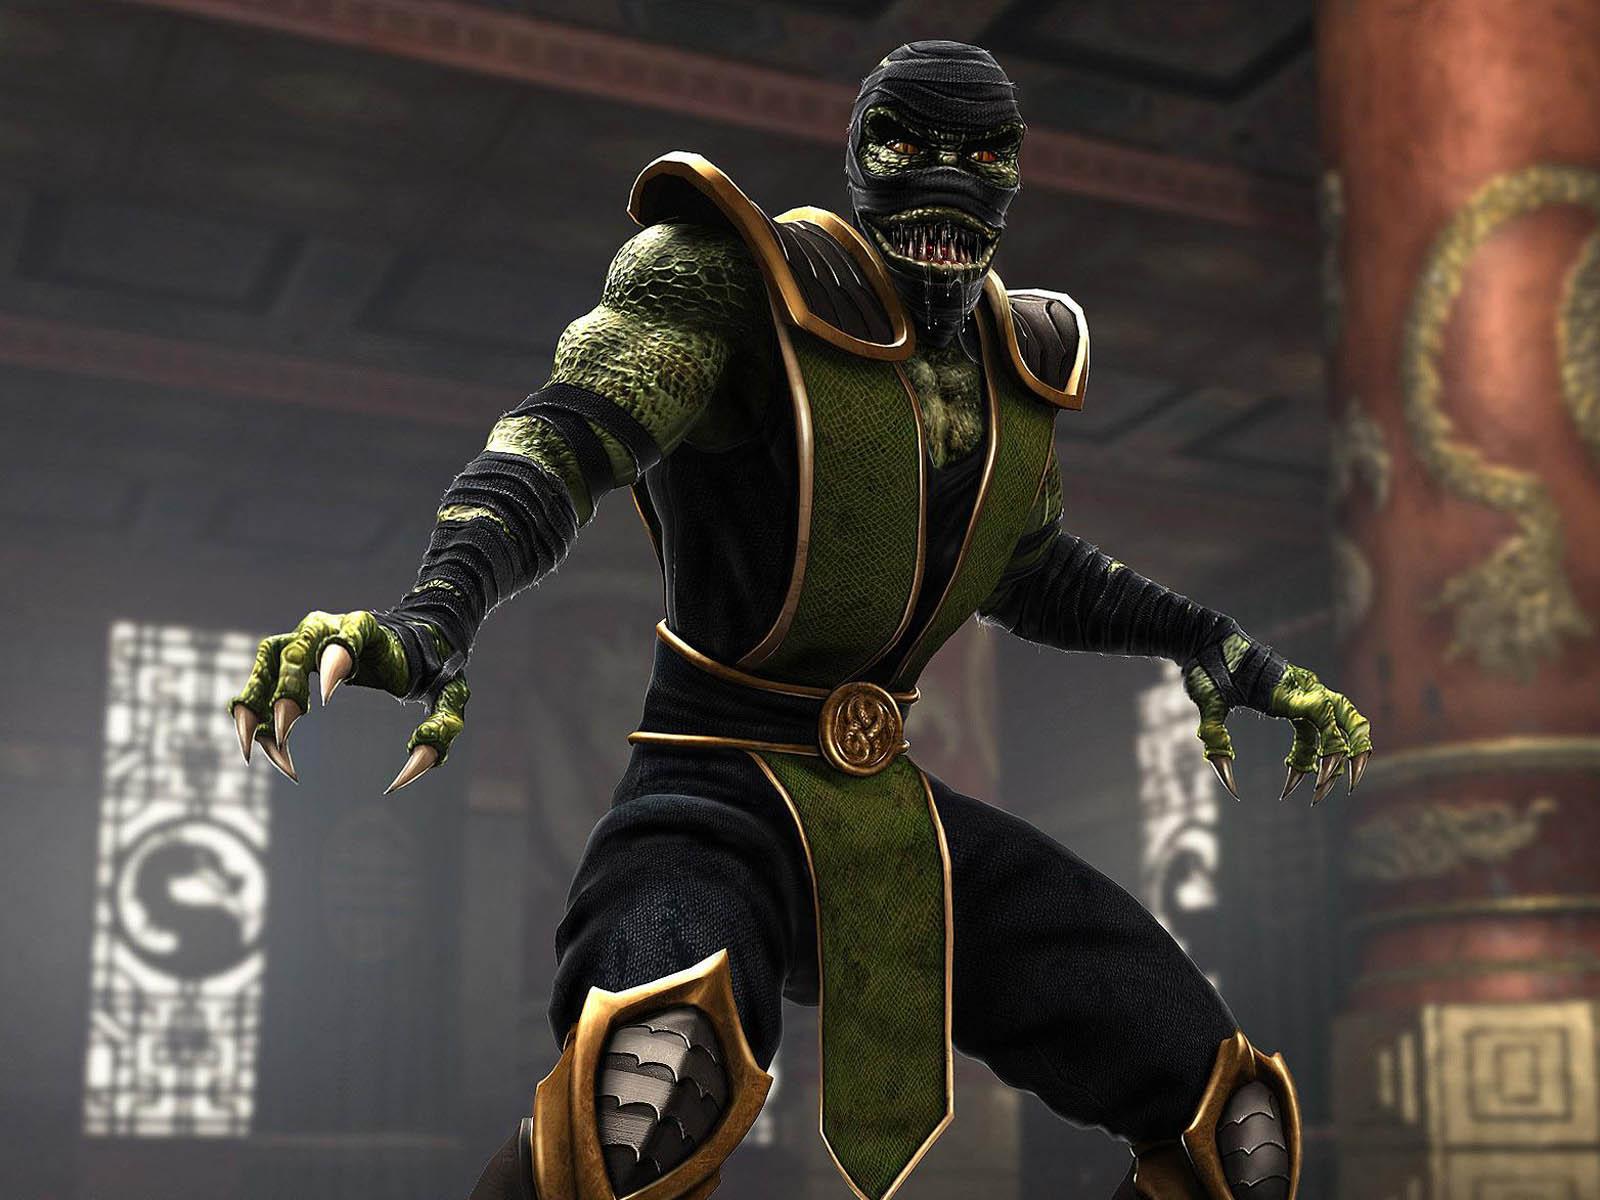 wallpapers: Mortal Kombat Game Wallpapers - photo#33